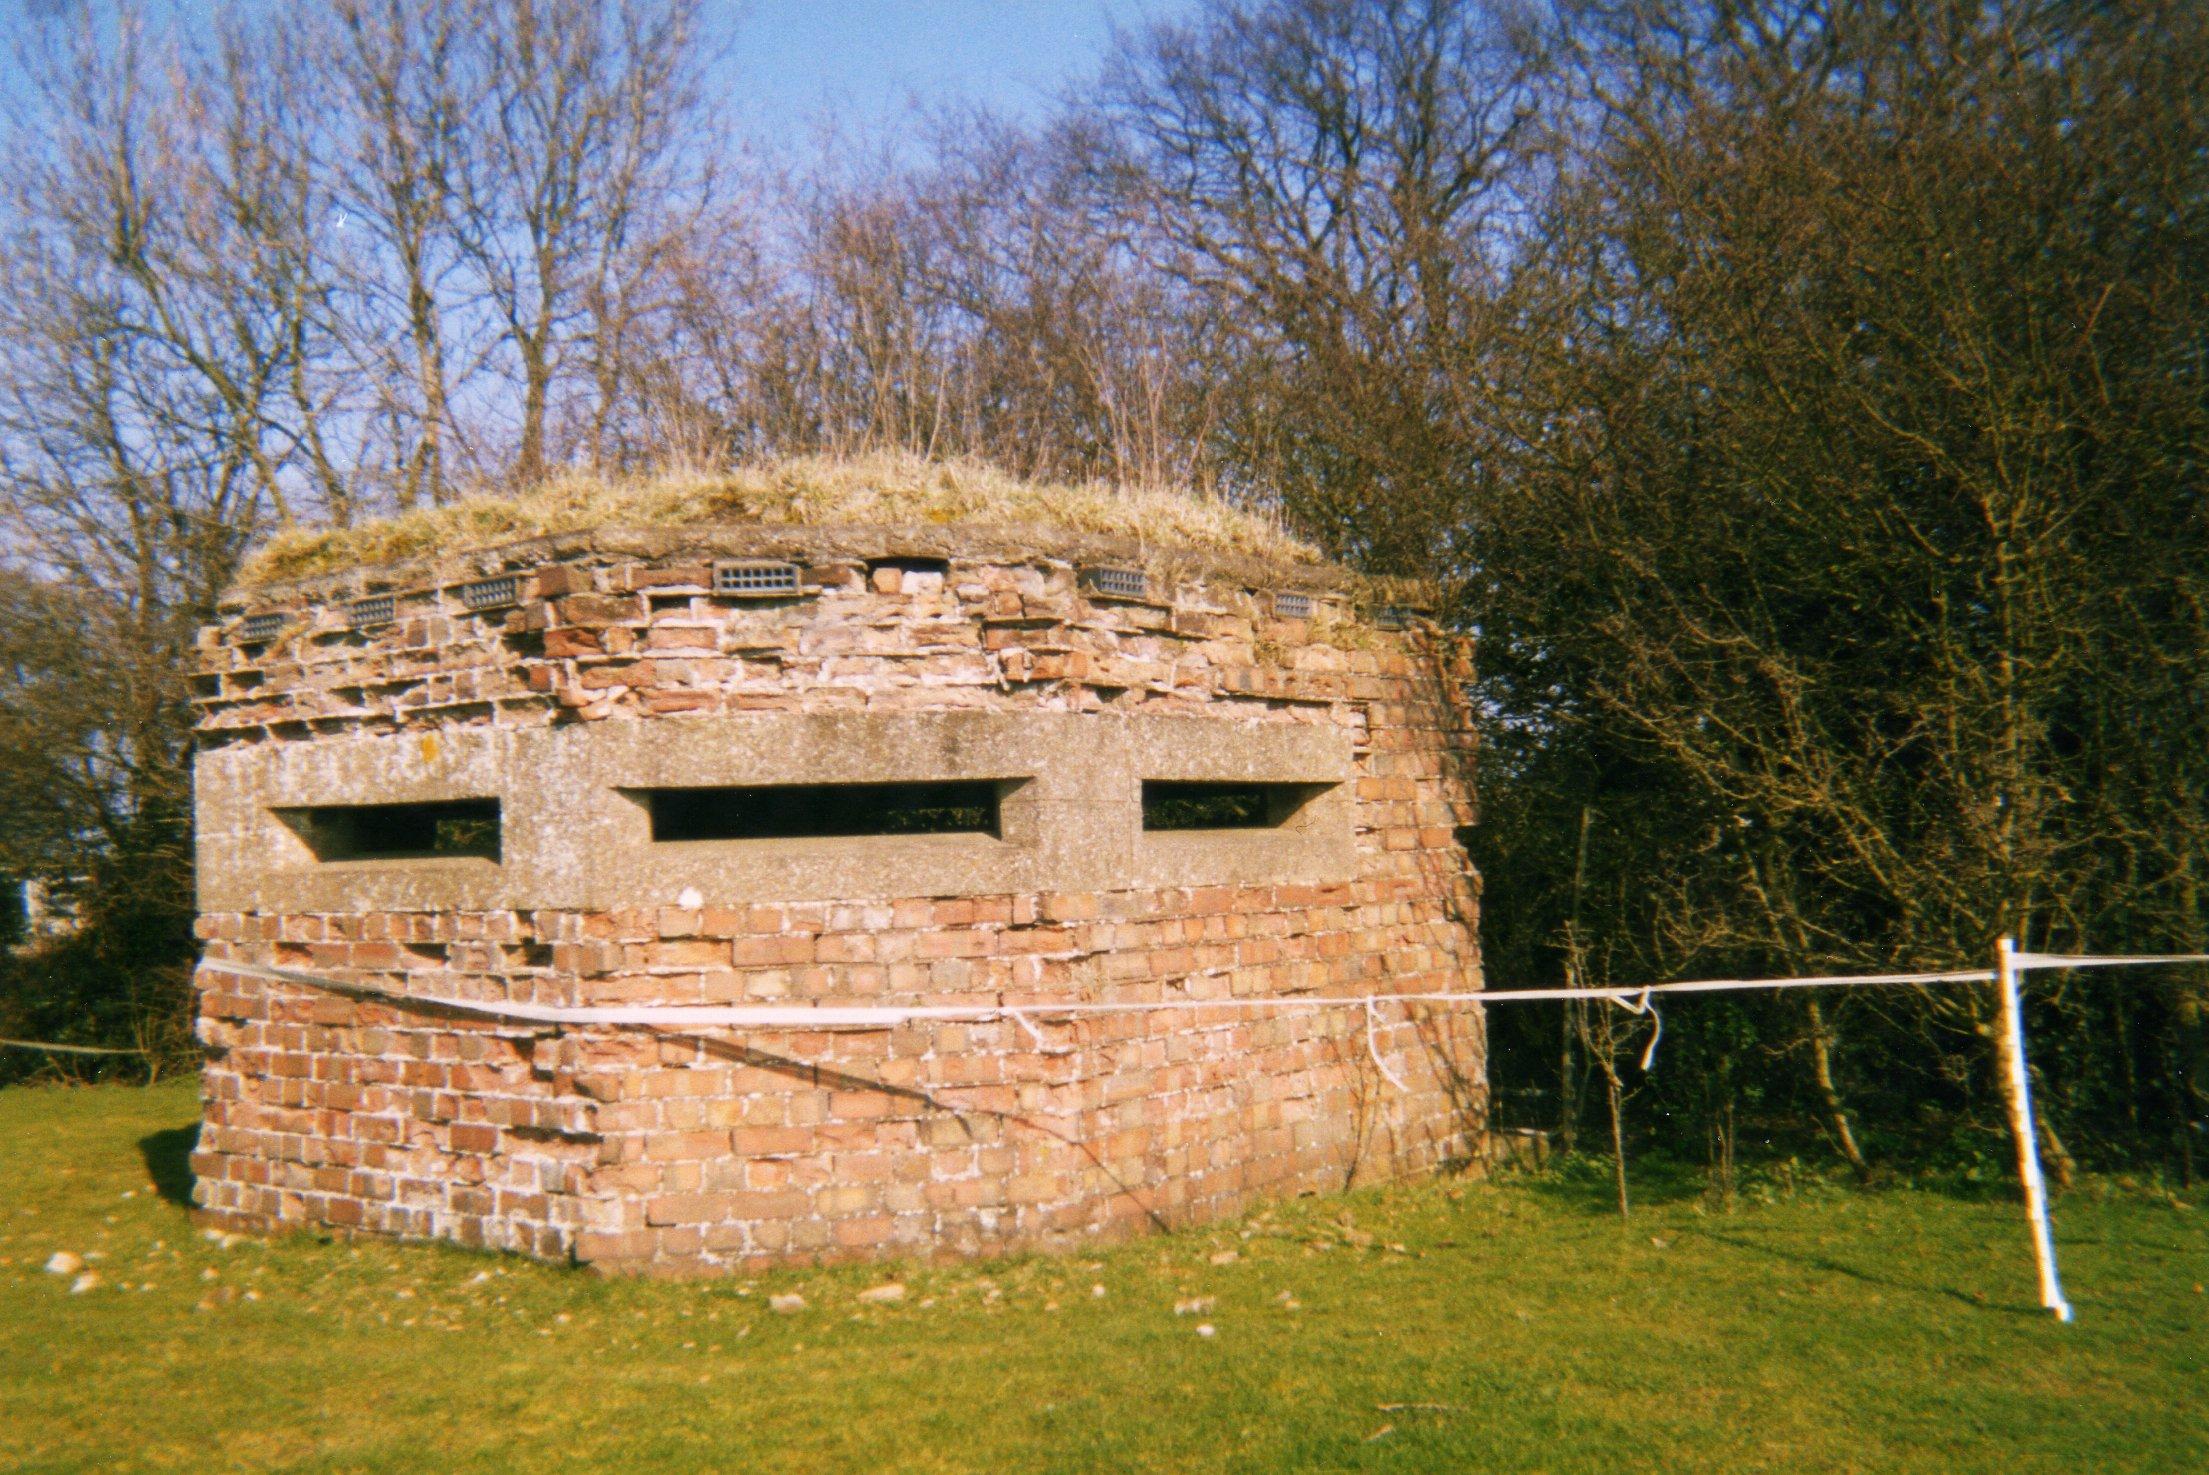 Hinckley Pillbox